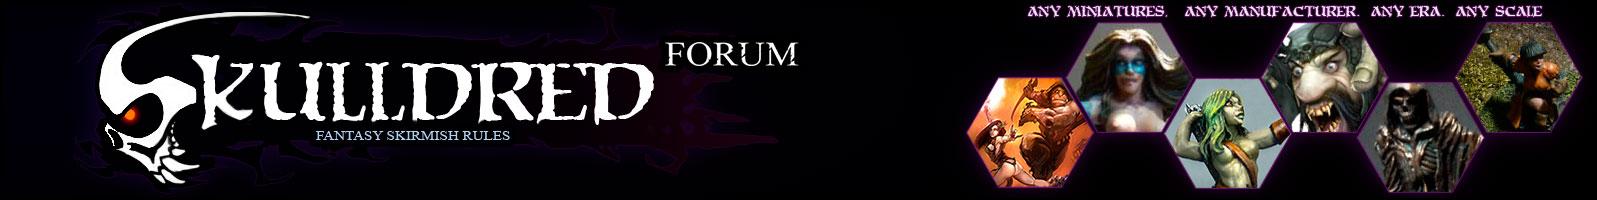 SKULLDRED Forum Beta